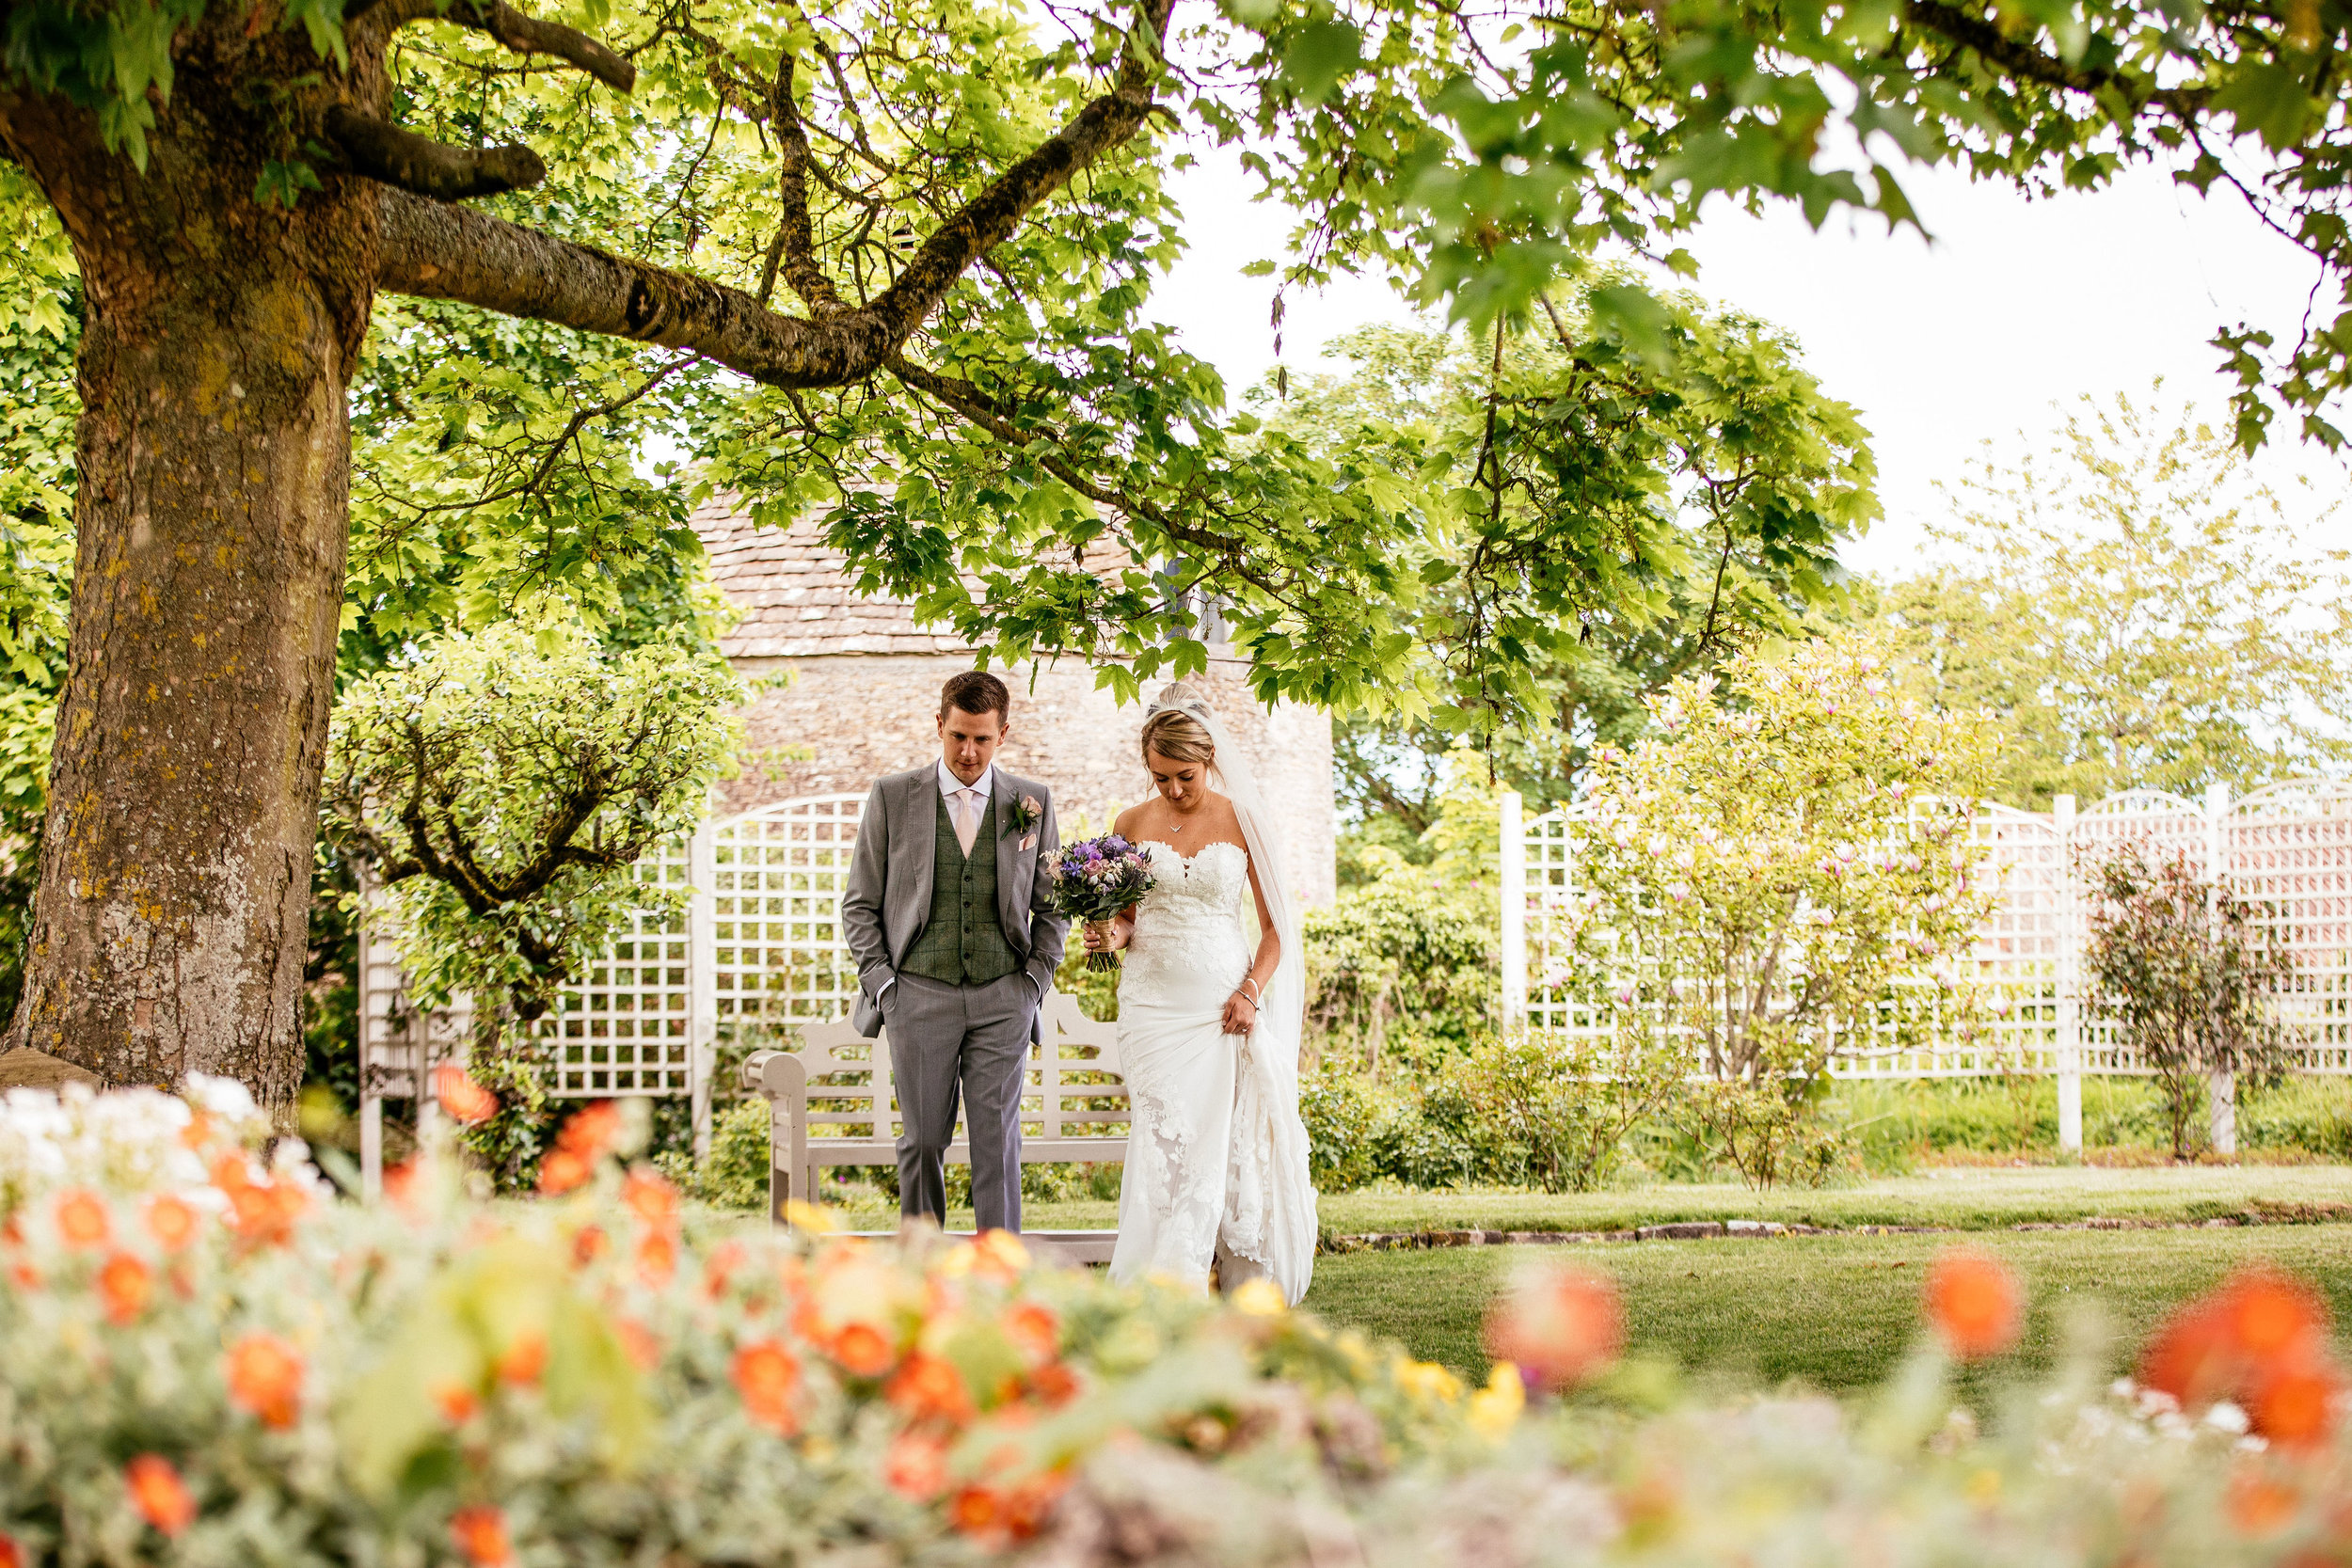 Becky-and-Sam-Wedding-650.jpg